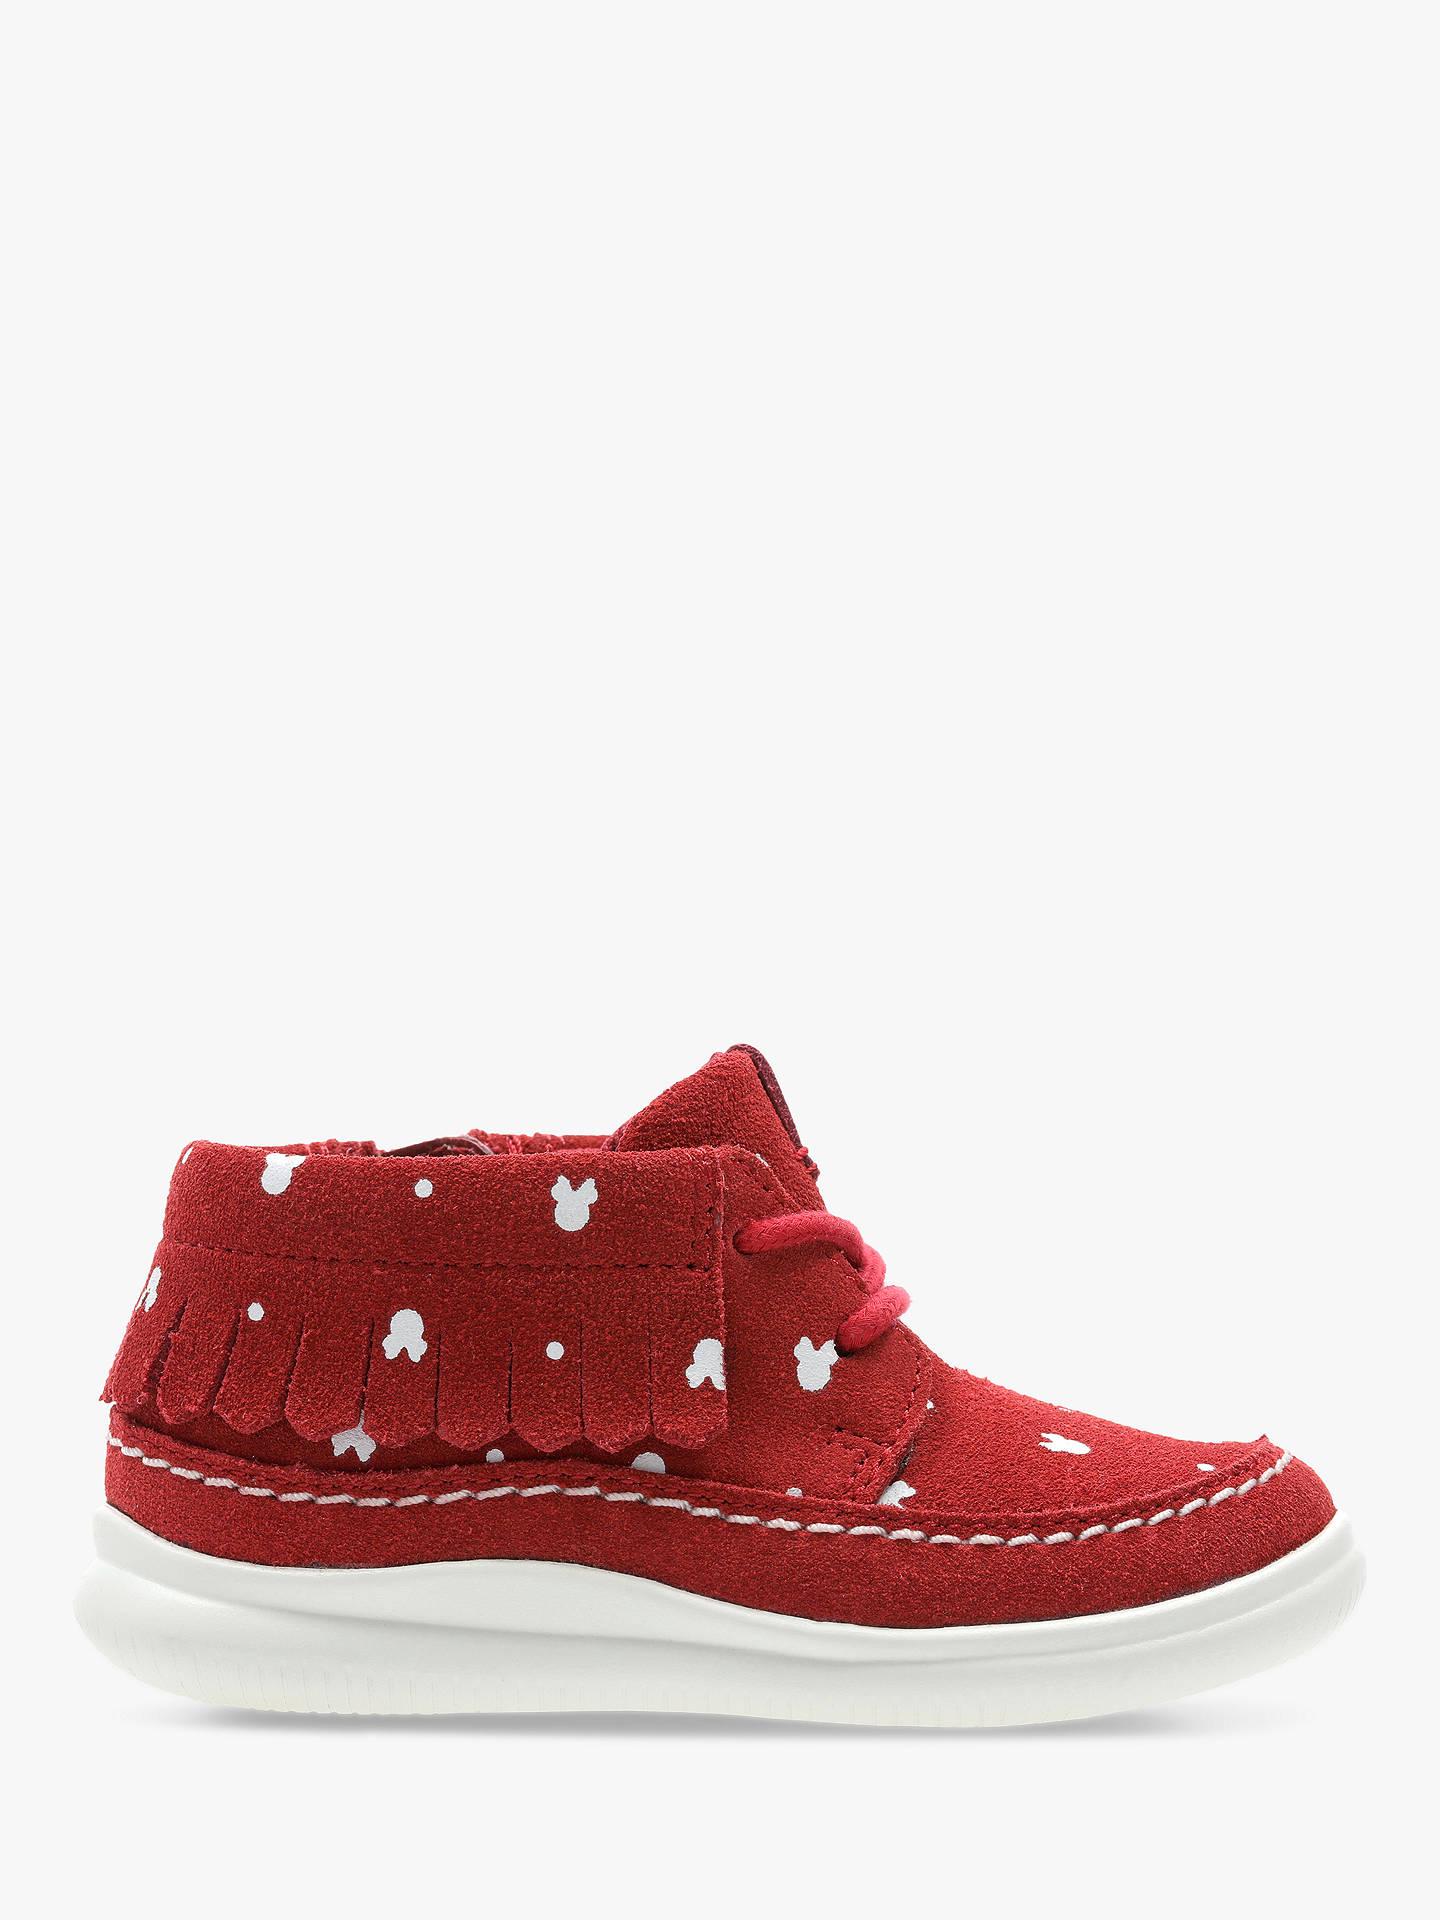 a4cc6cc0f90 Clarks Children's Cloud Polka Disney Minnie Mouse Shoes, Red